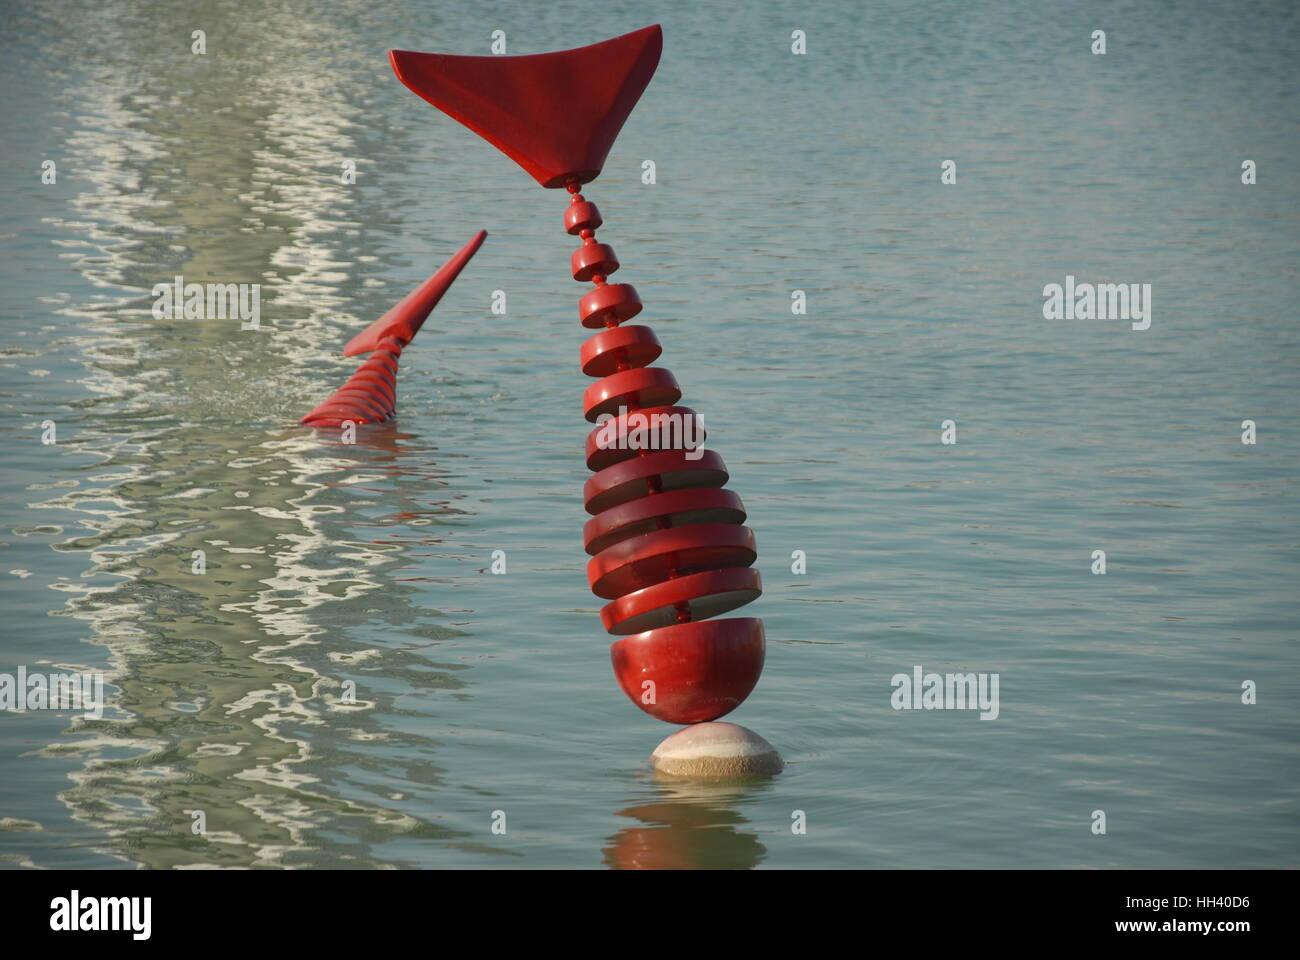 Pool ornament at the 2016 EXPO Antalya Stock Photo